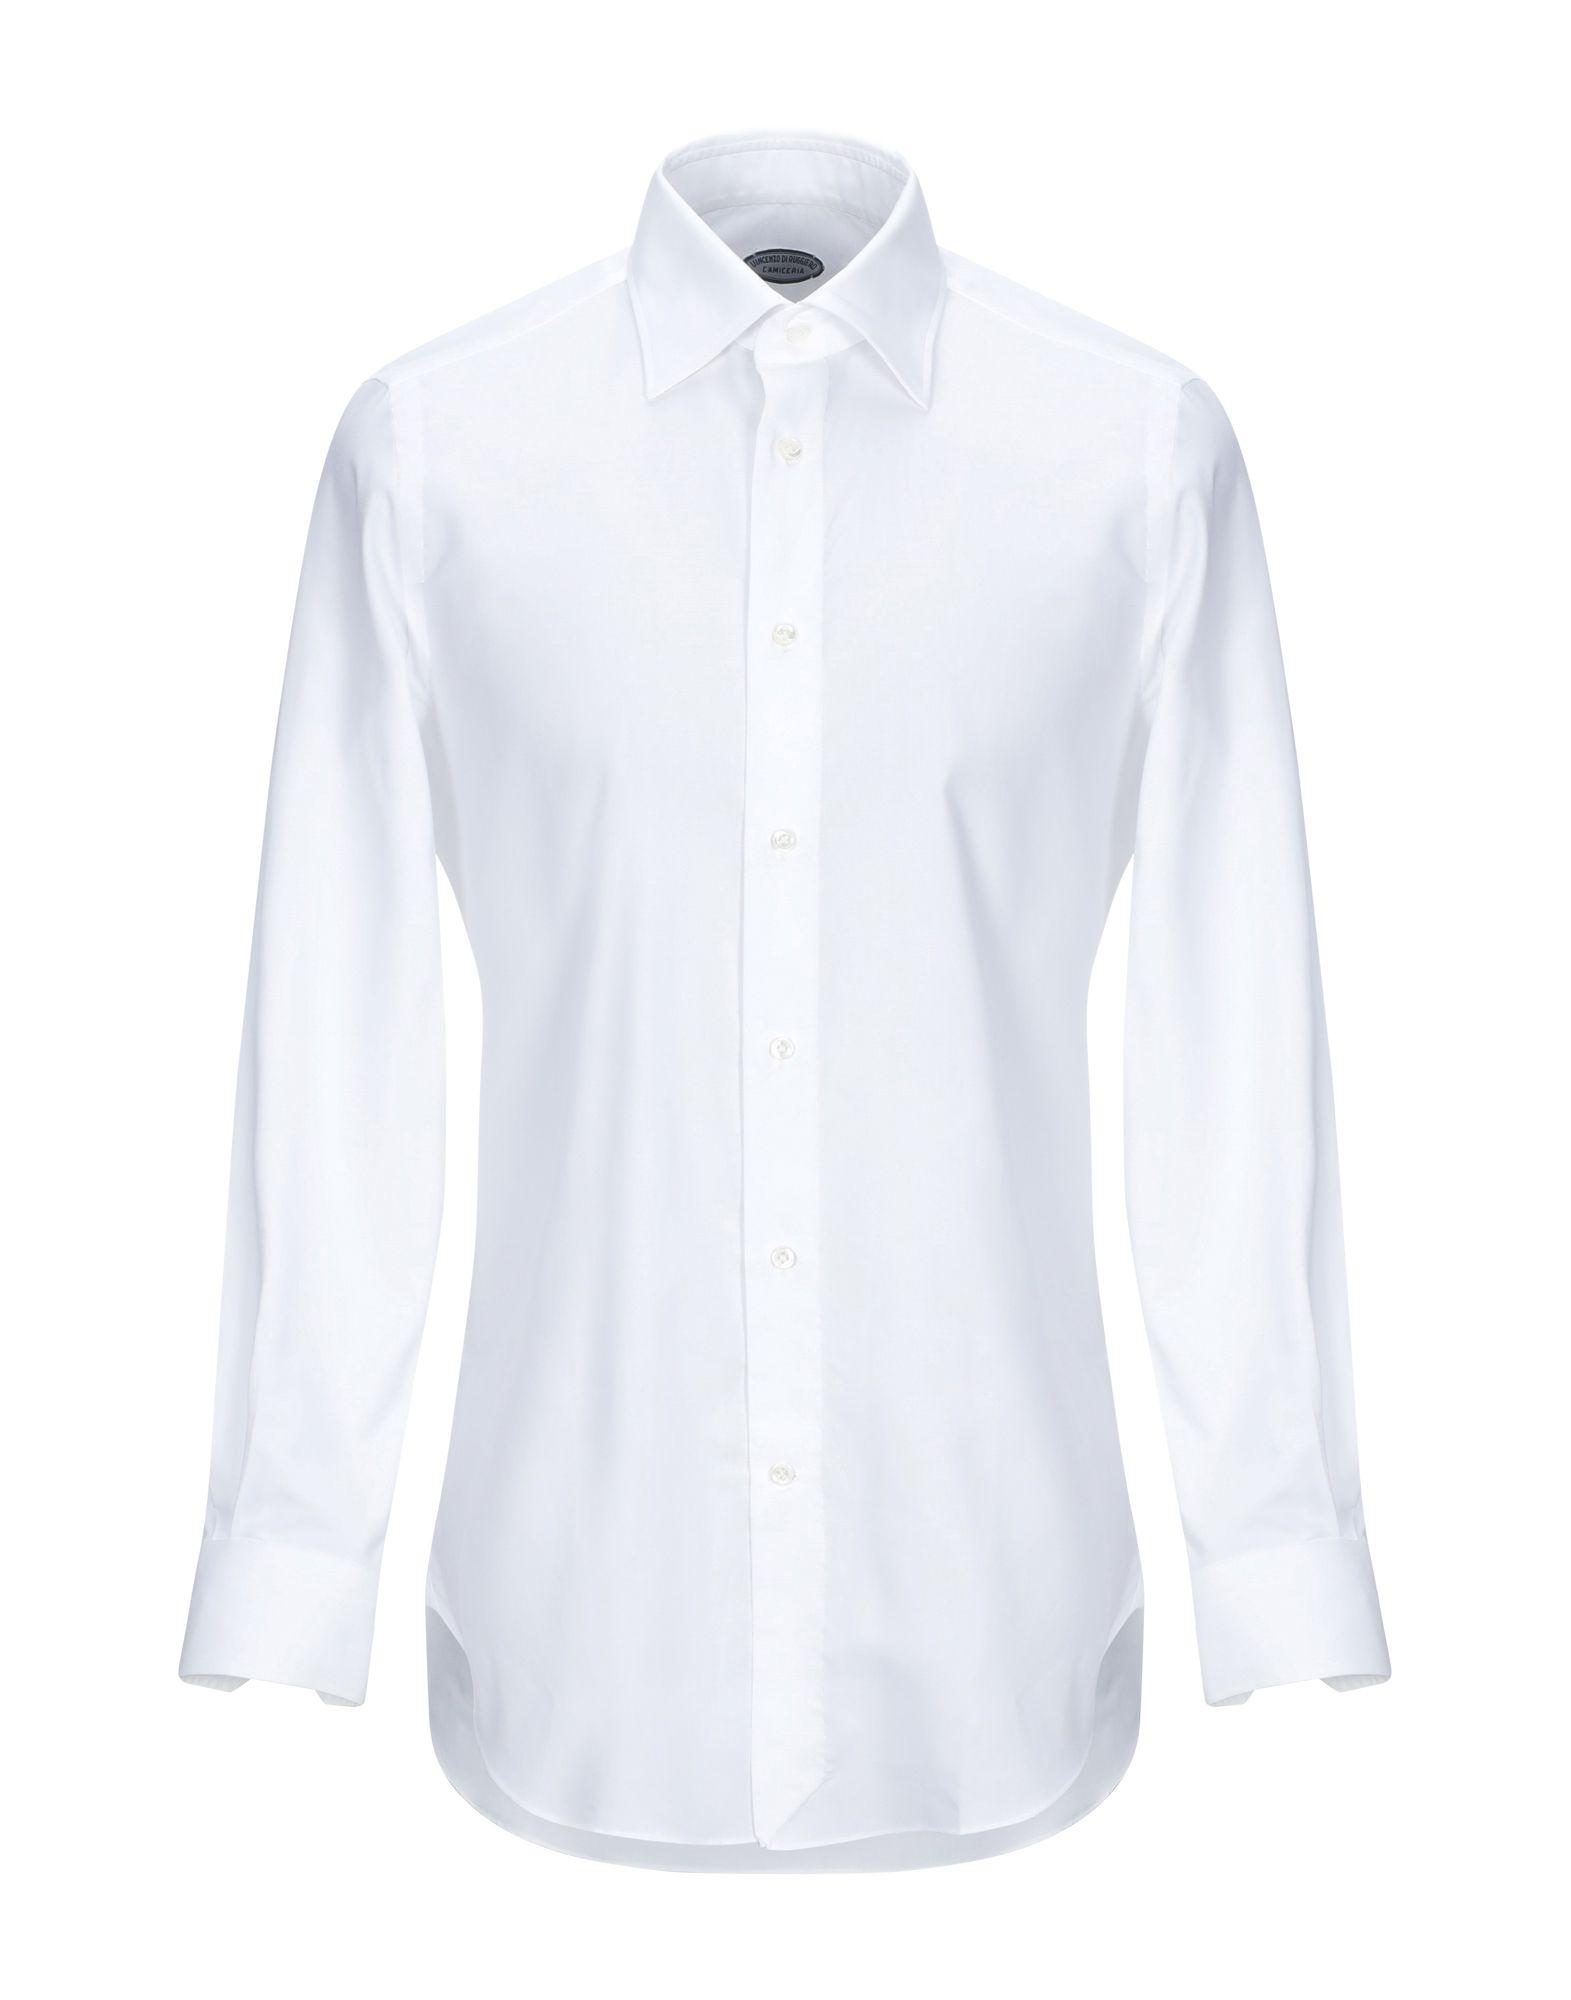 купить CAMICERIA VINCENZO DI RUGGIERO Pубашка по цене 10750 рублей